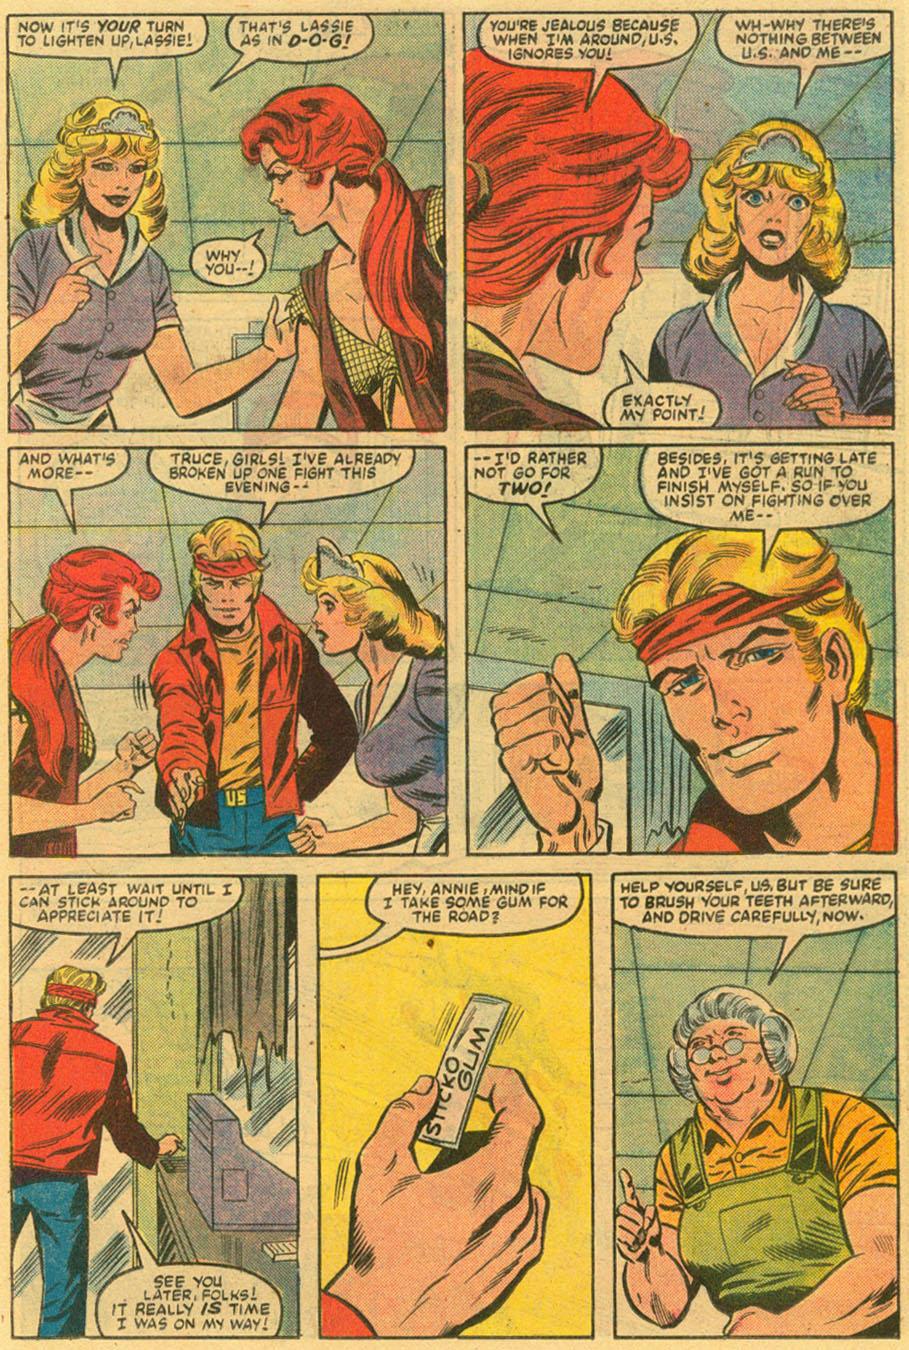 Read online U.S. 1 comic -  Issue #2 - 13